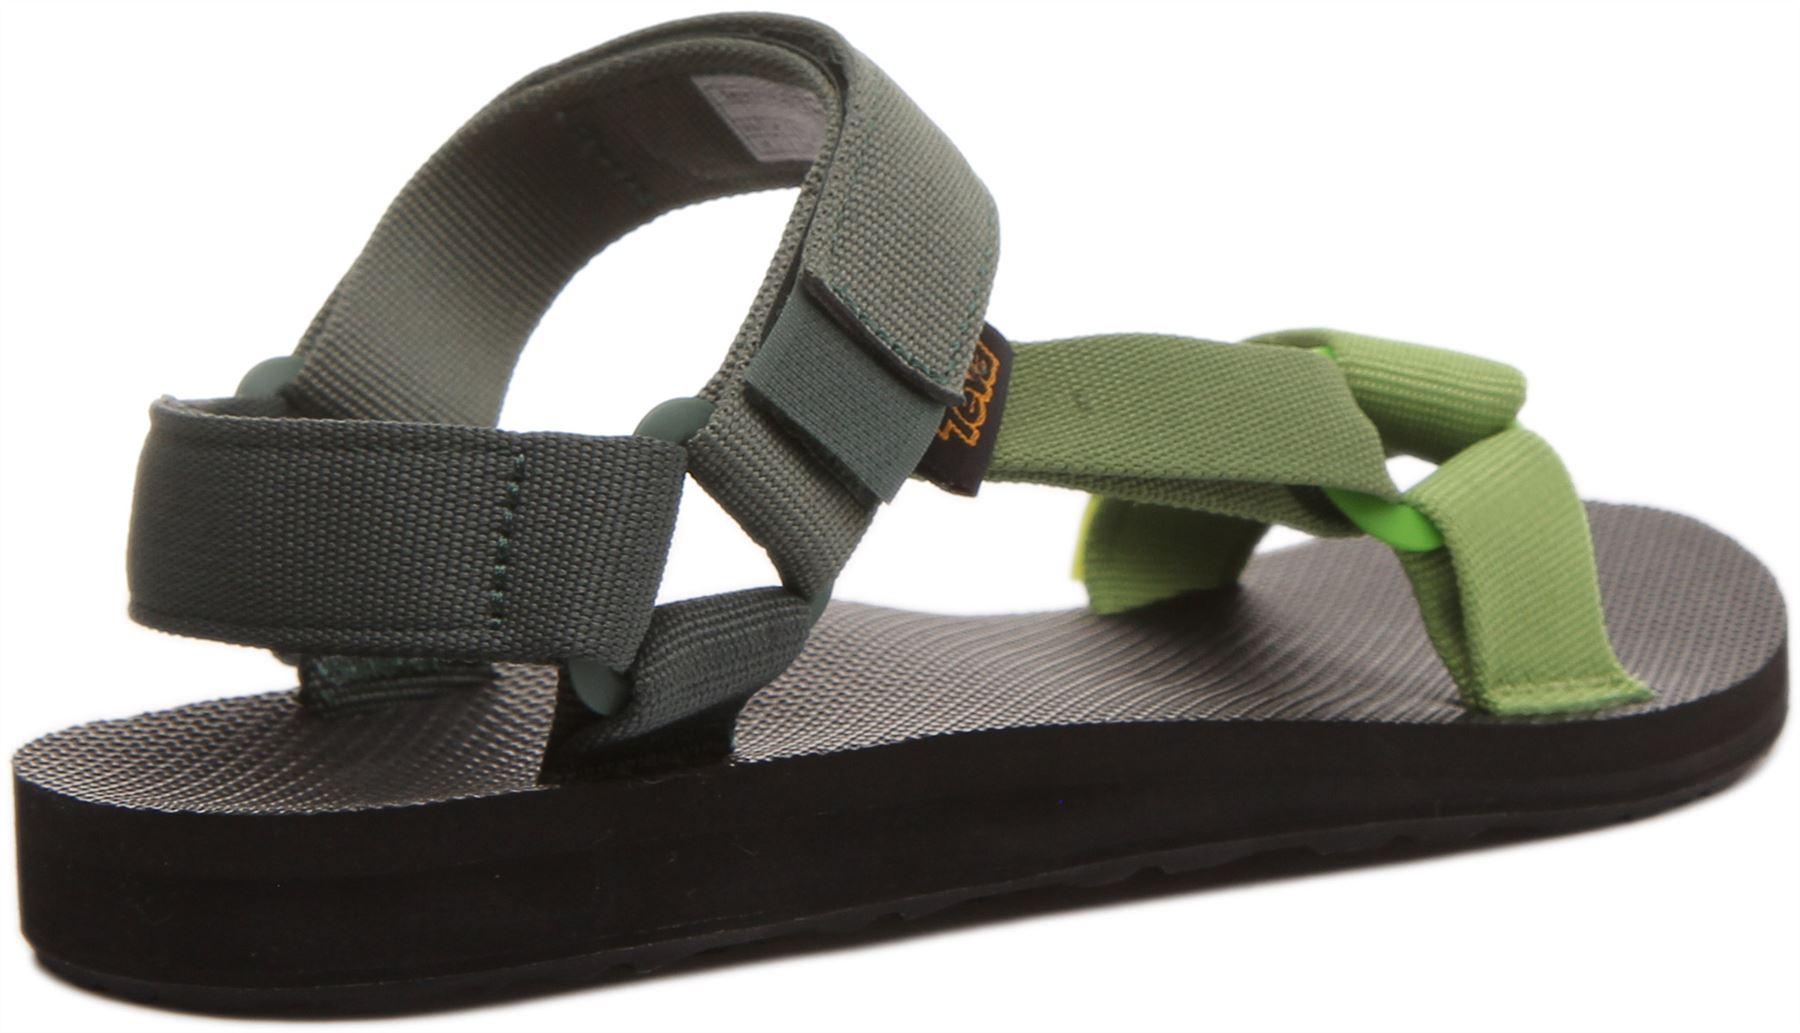 miniatura 9 - Teva Original Universal Da Uomo Con Cinturino Sandalo in Verde Taglia UK 6 - 12